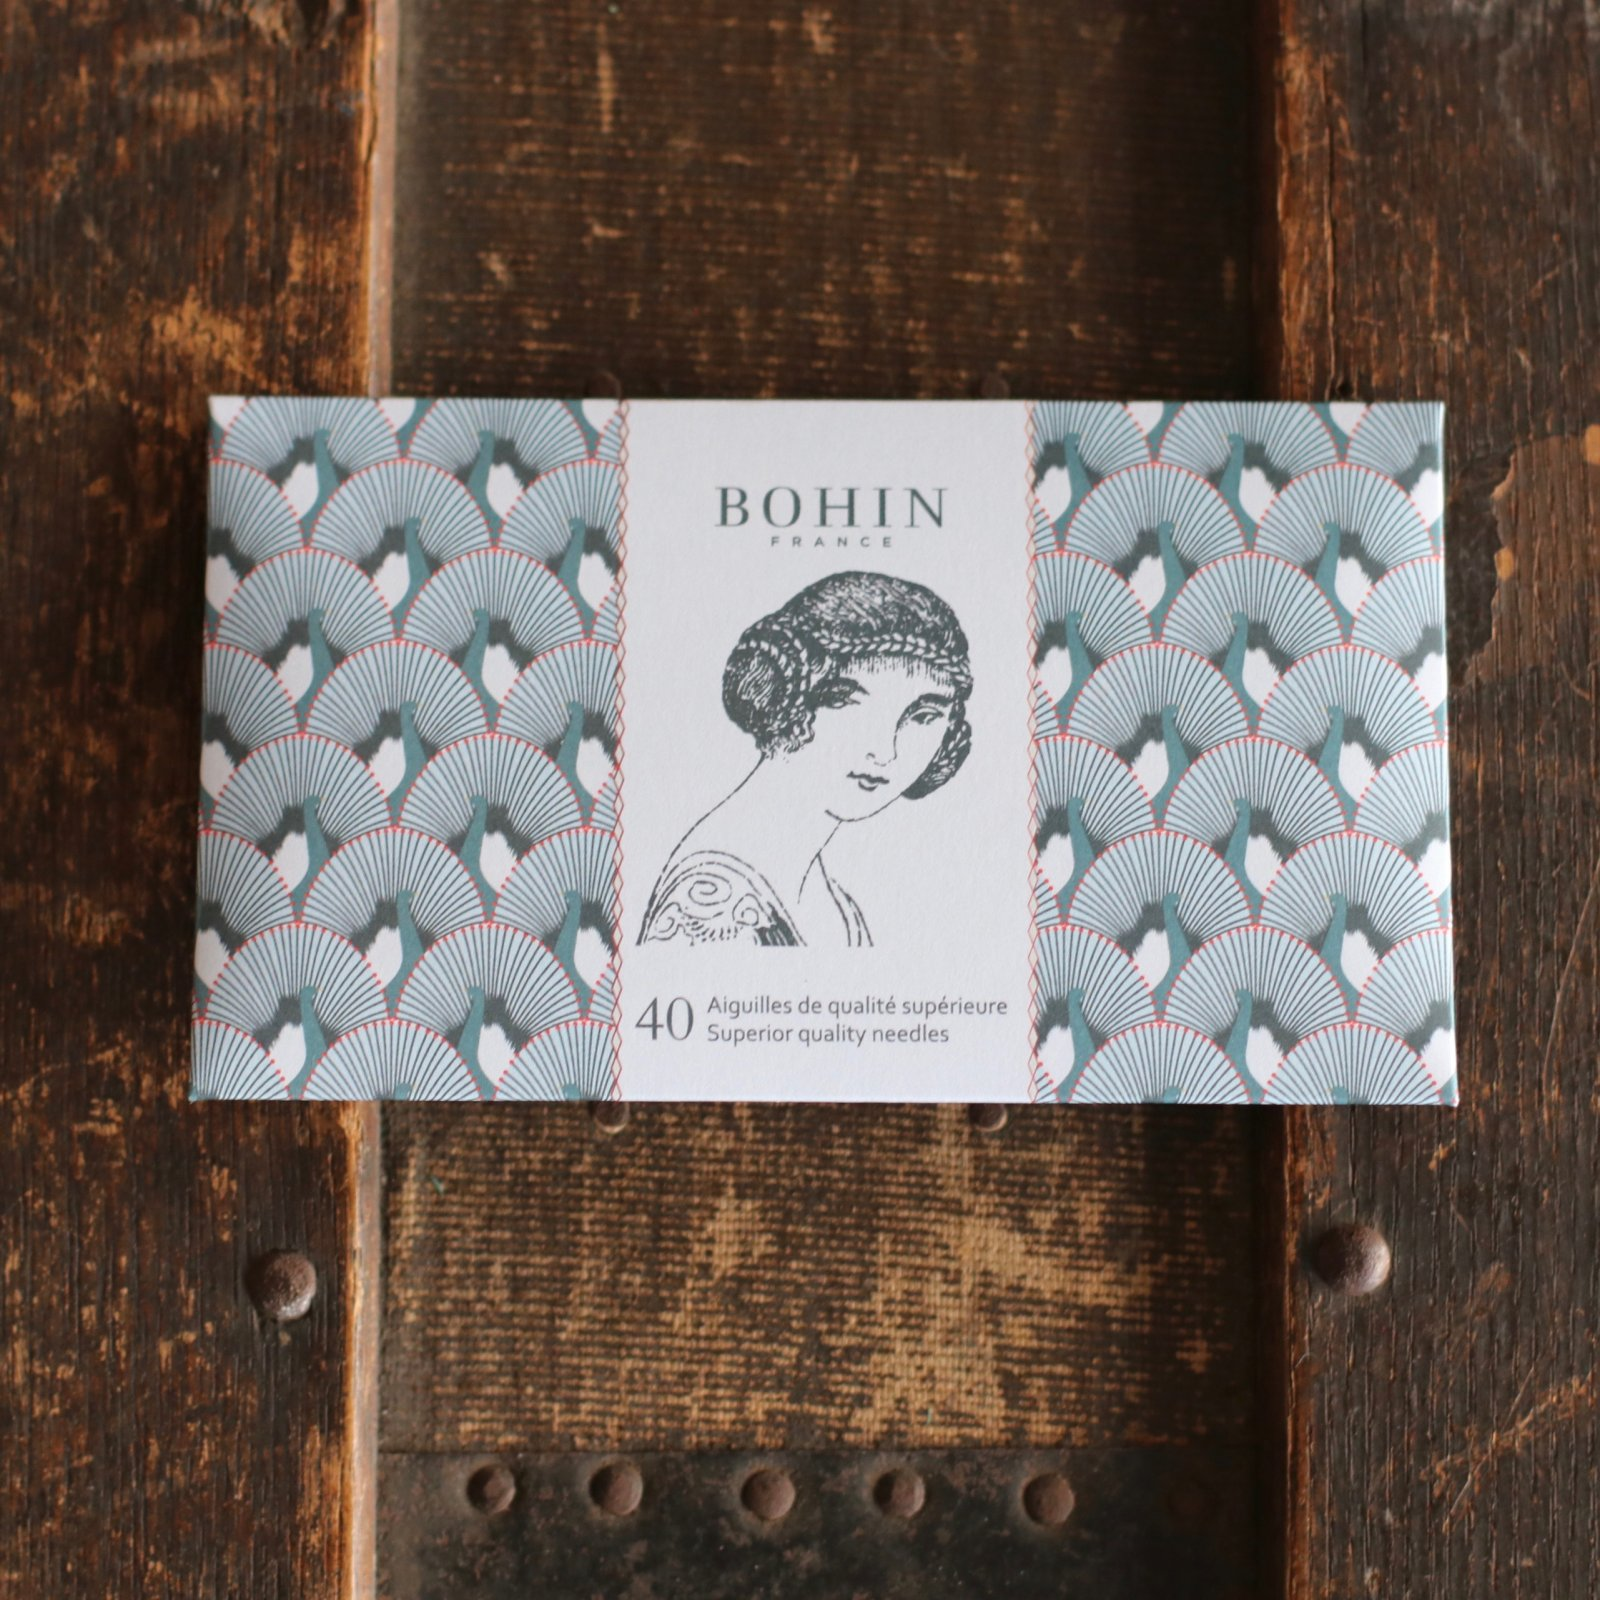 Bohin Vintage Assorted Needles - 40 ct.